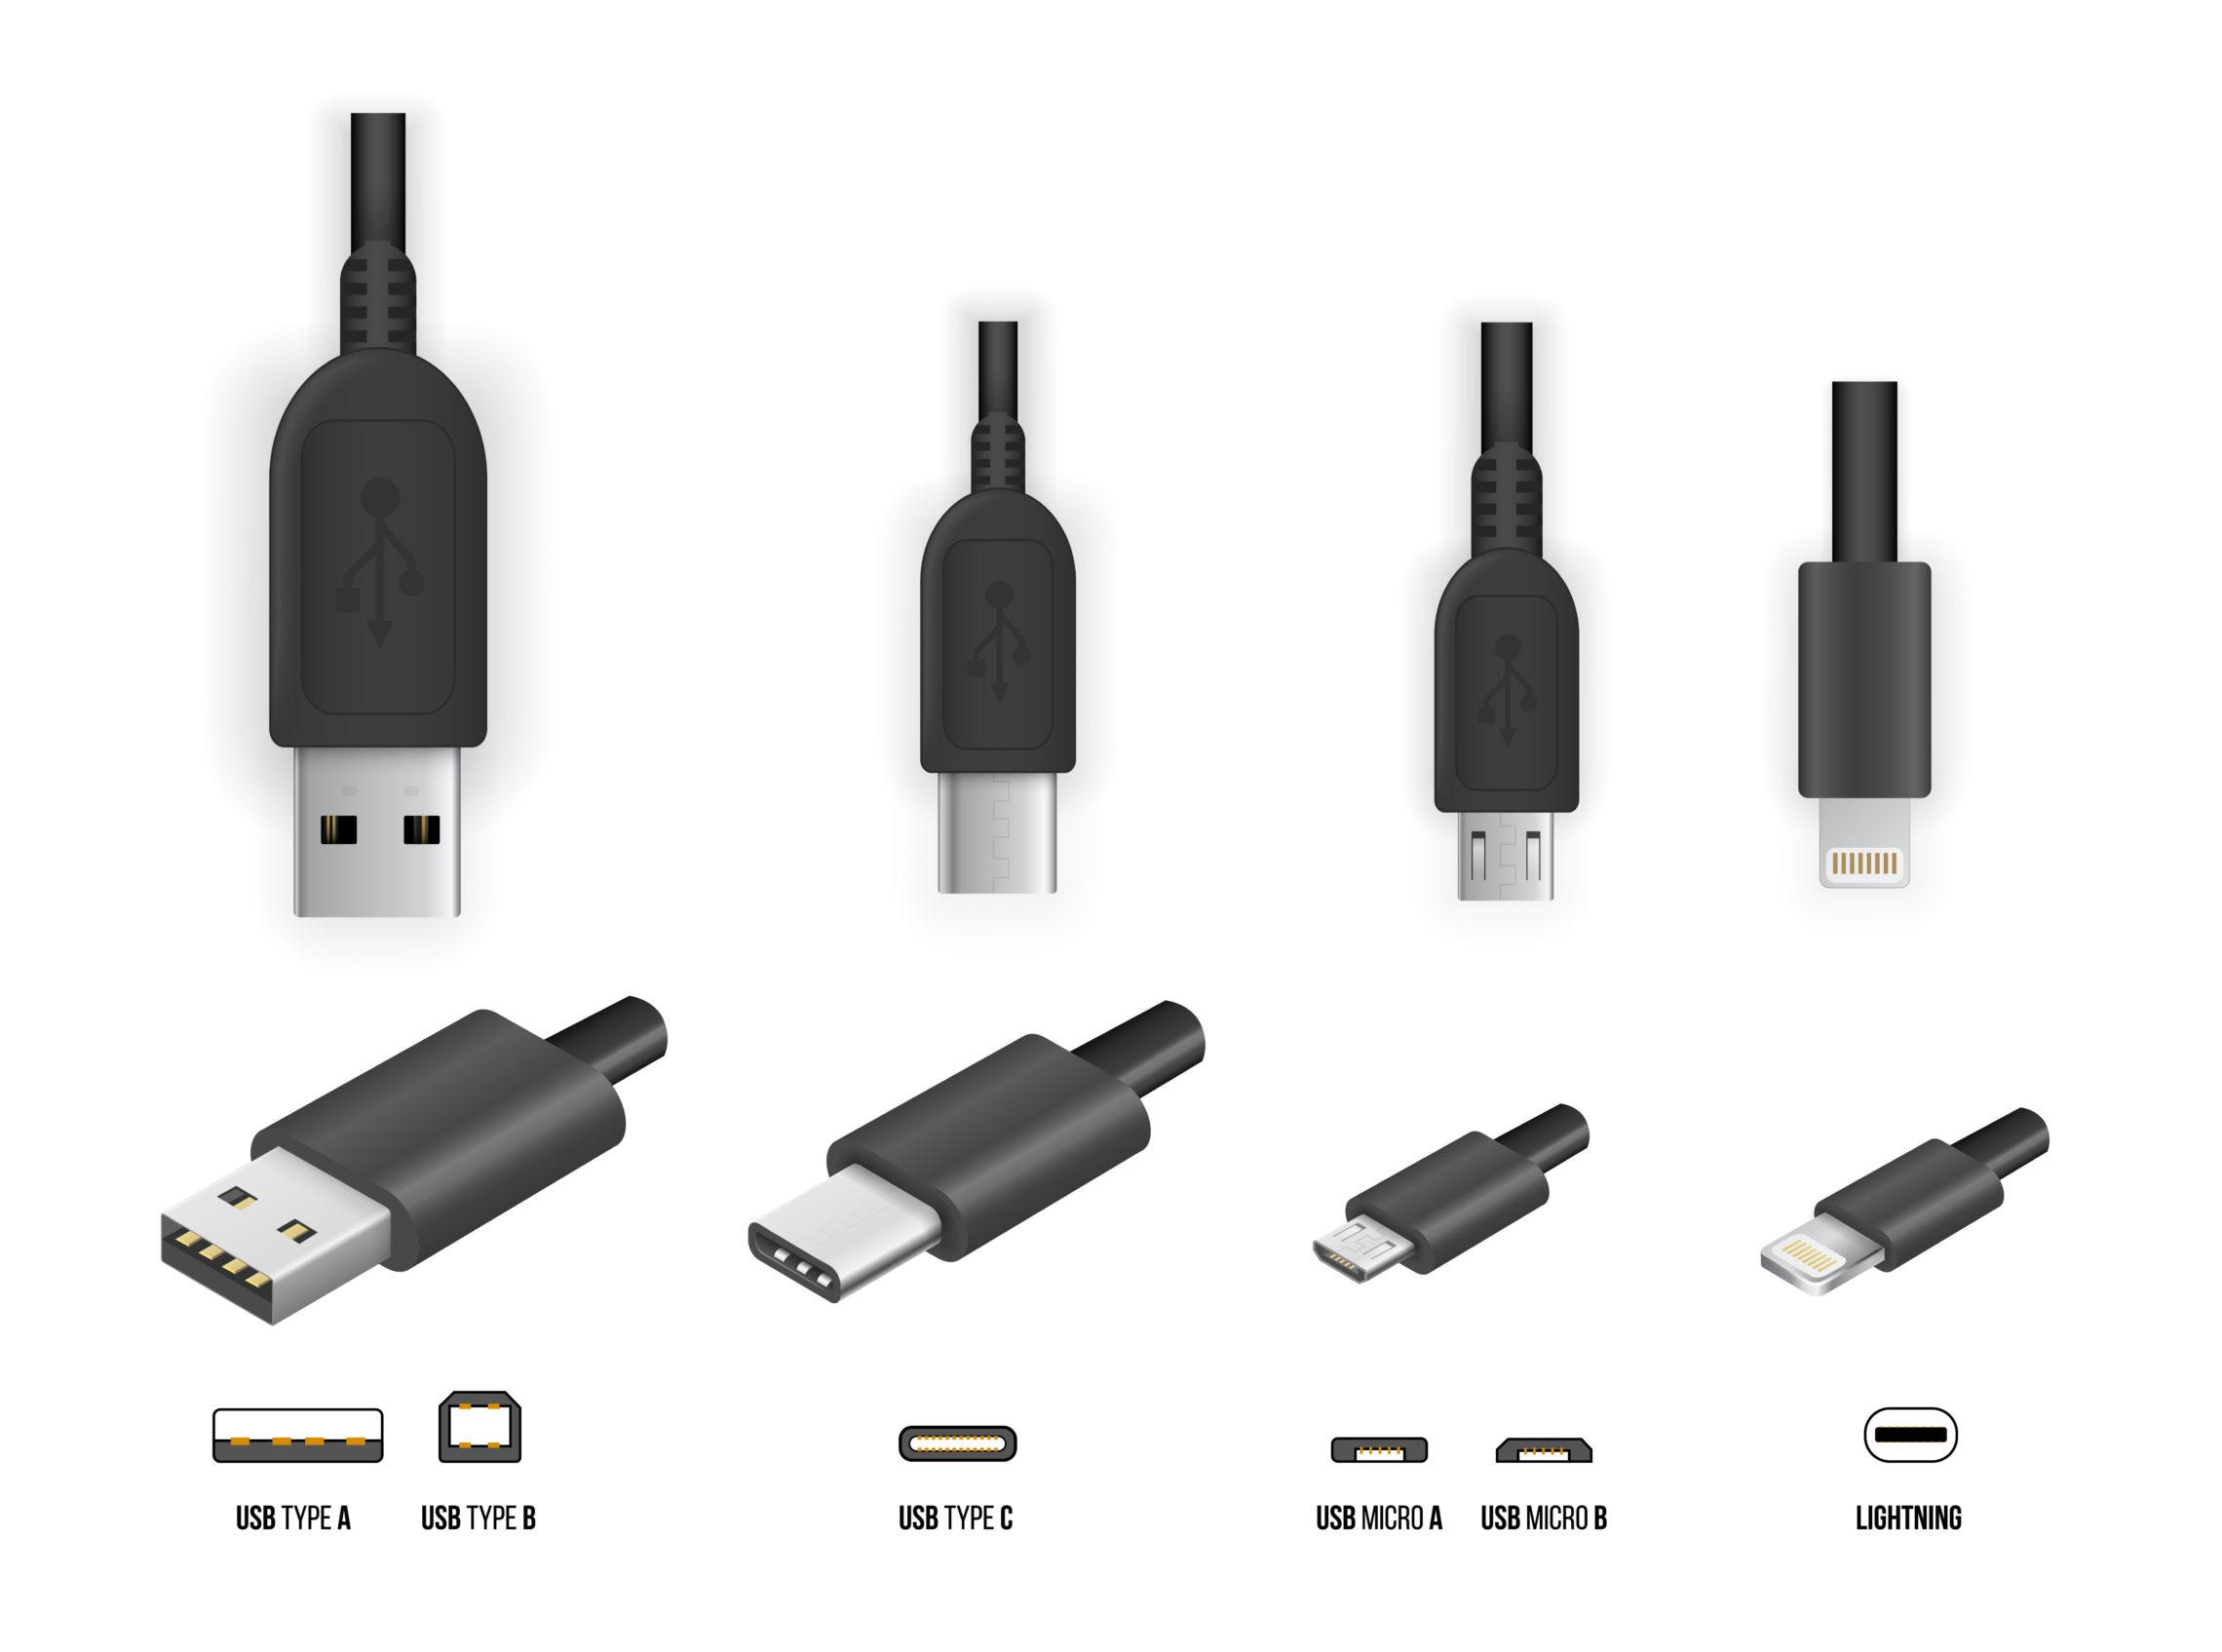 Grafik zu verschiedenen USB-Steckverbindungen